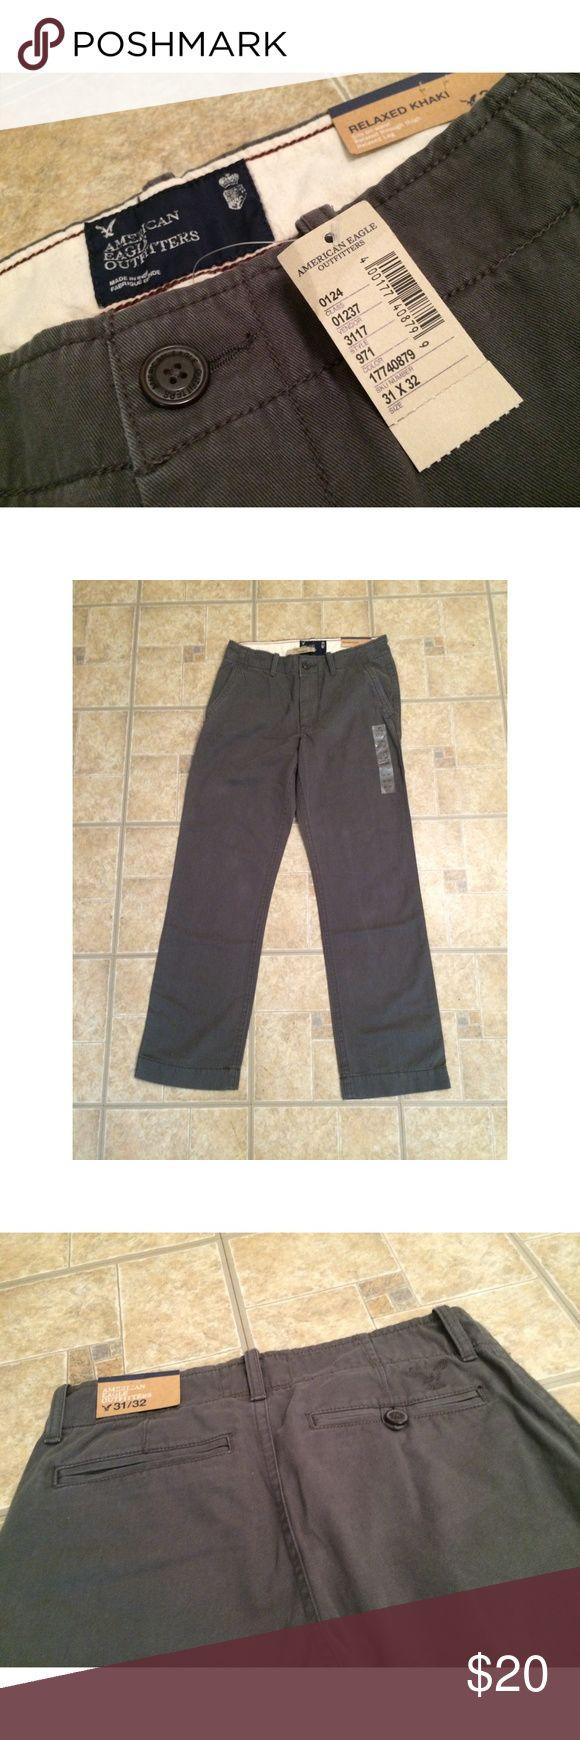 American Eagle Khaki Pants for Men BRAND NEW WITH TAGS!! American Eagle, Relaxed fit khaki pant for men. Dark gray color size 31 X 32. American Eagle Outfitters Pants Chinos & Khakis